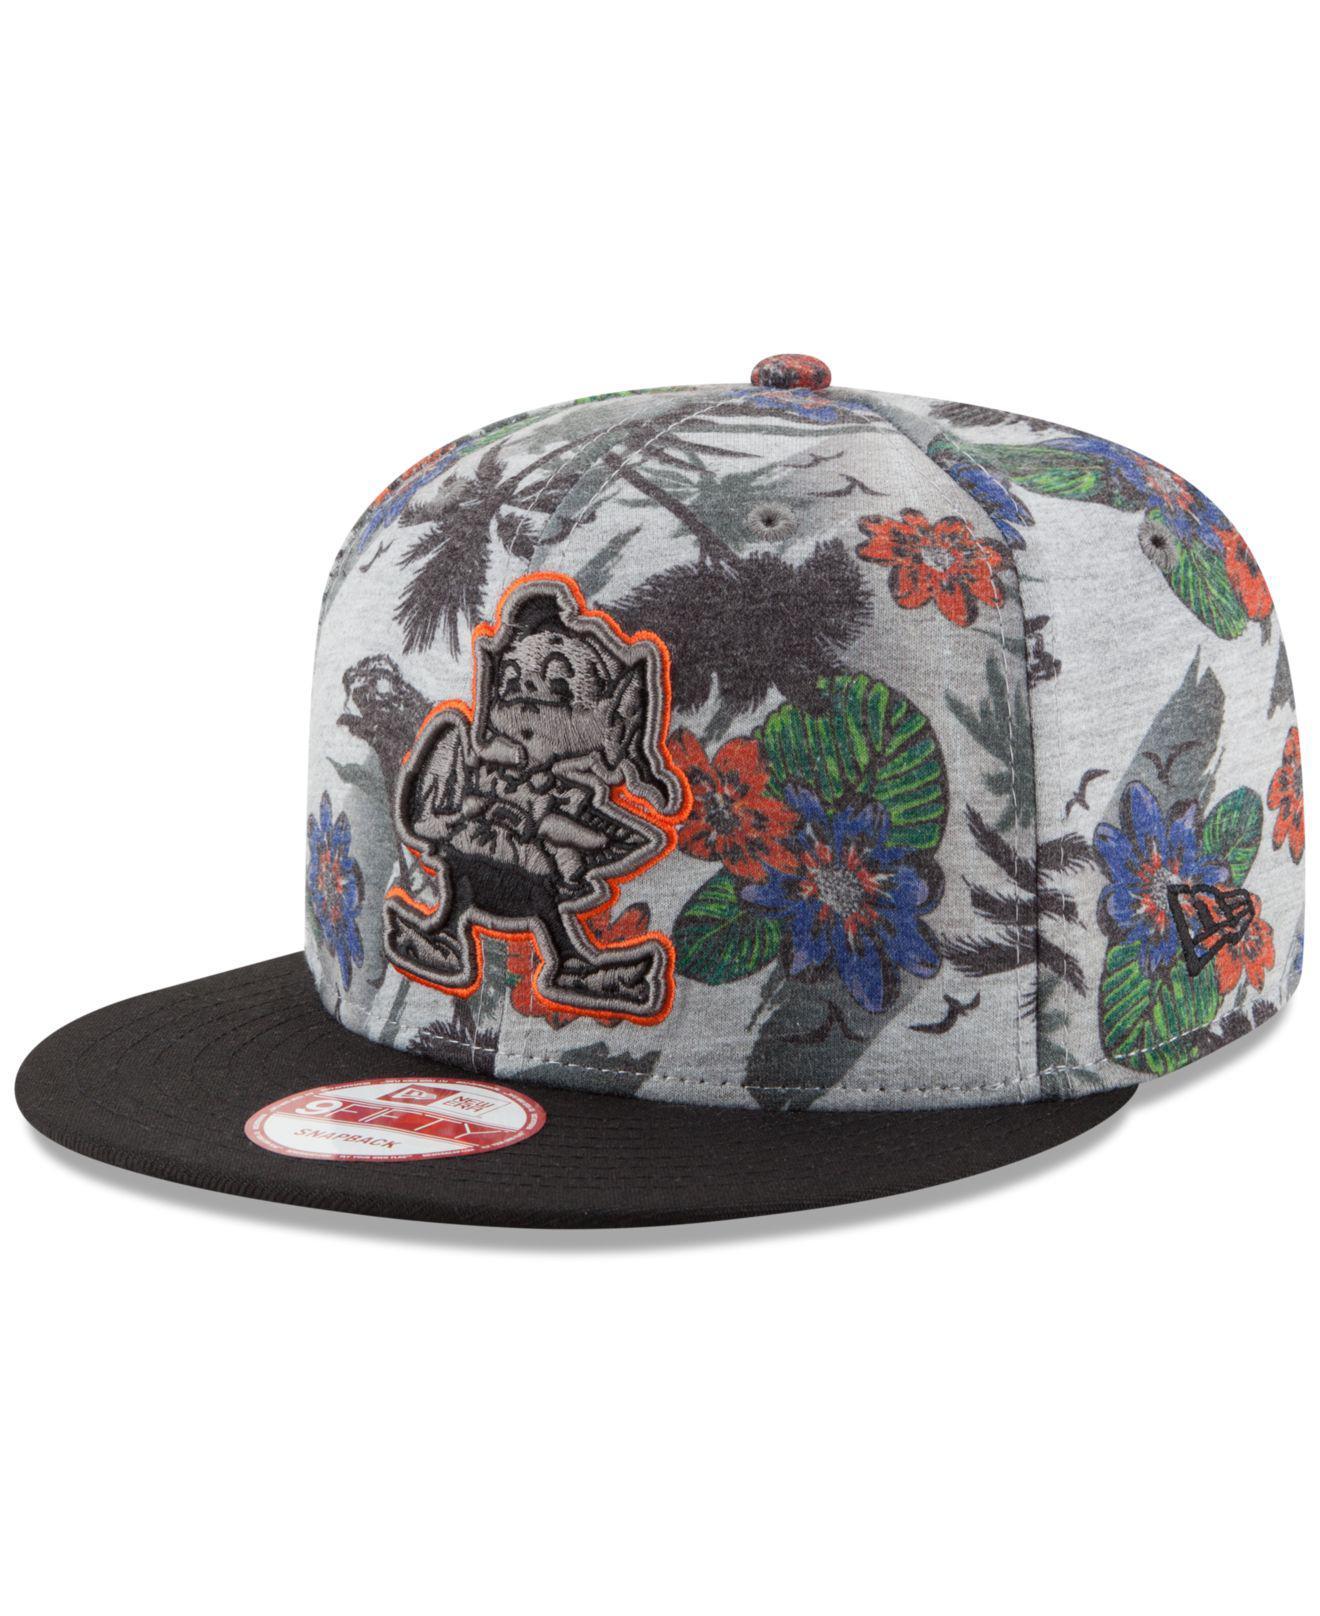 Lyst - KTZ Cleveland Browns Cool Breeze Trop 9fifty Snapback Cap in ... 56909b1cb